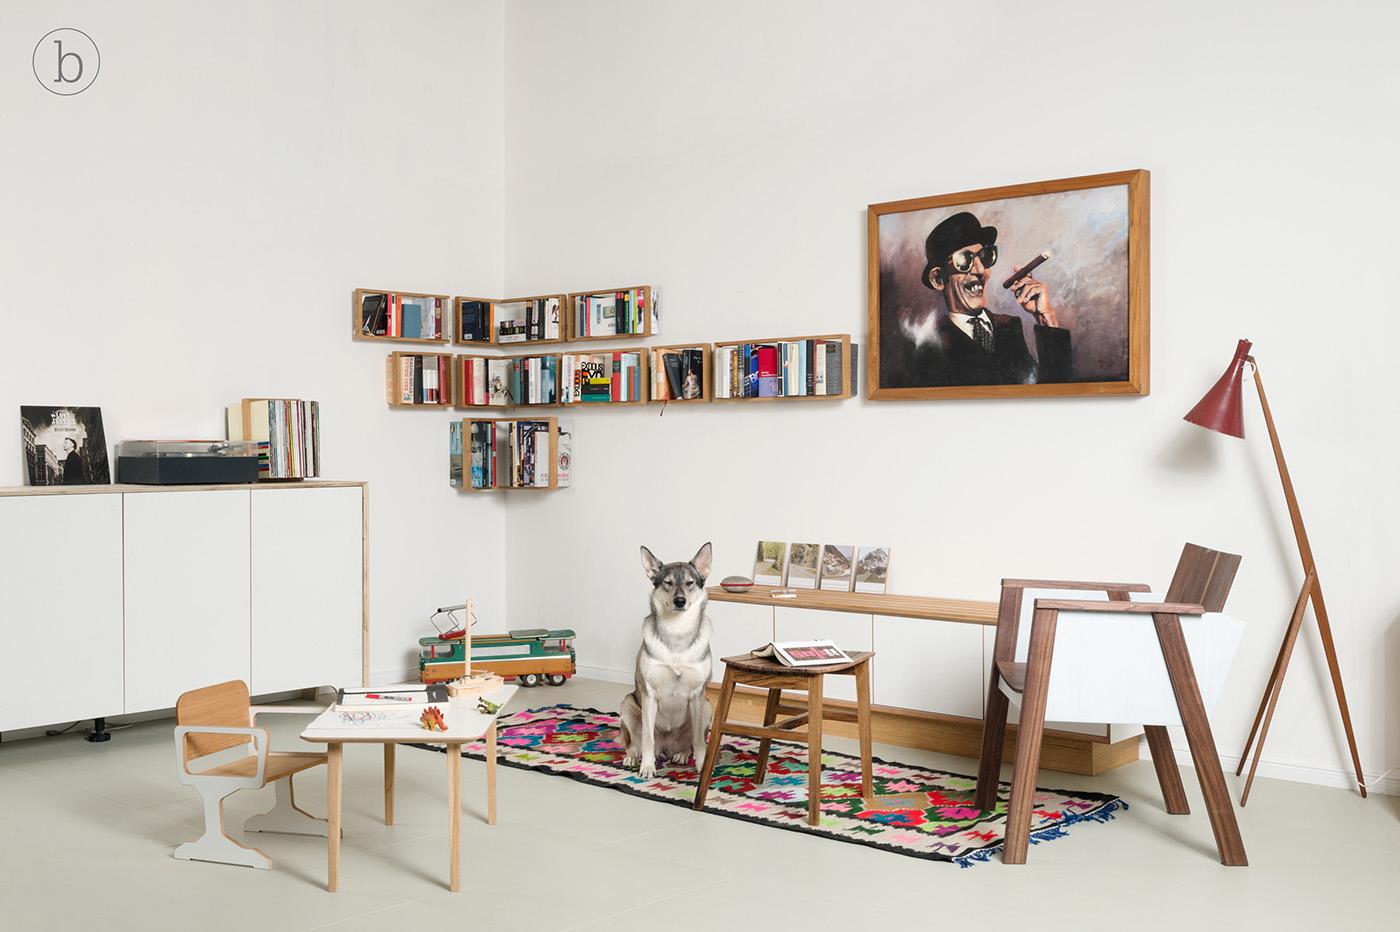 regal b by das kleine b on behance. Black Bedroom Furniture Sets. Home Design Ideas